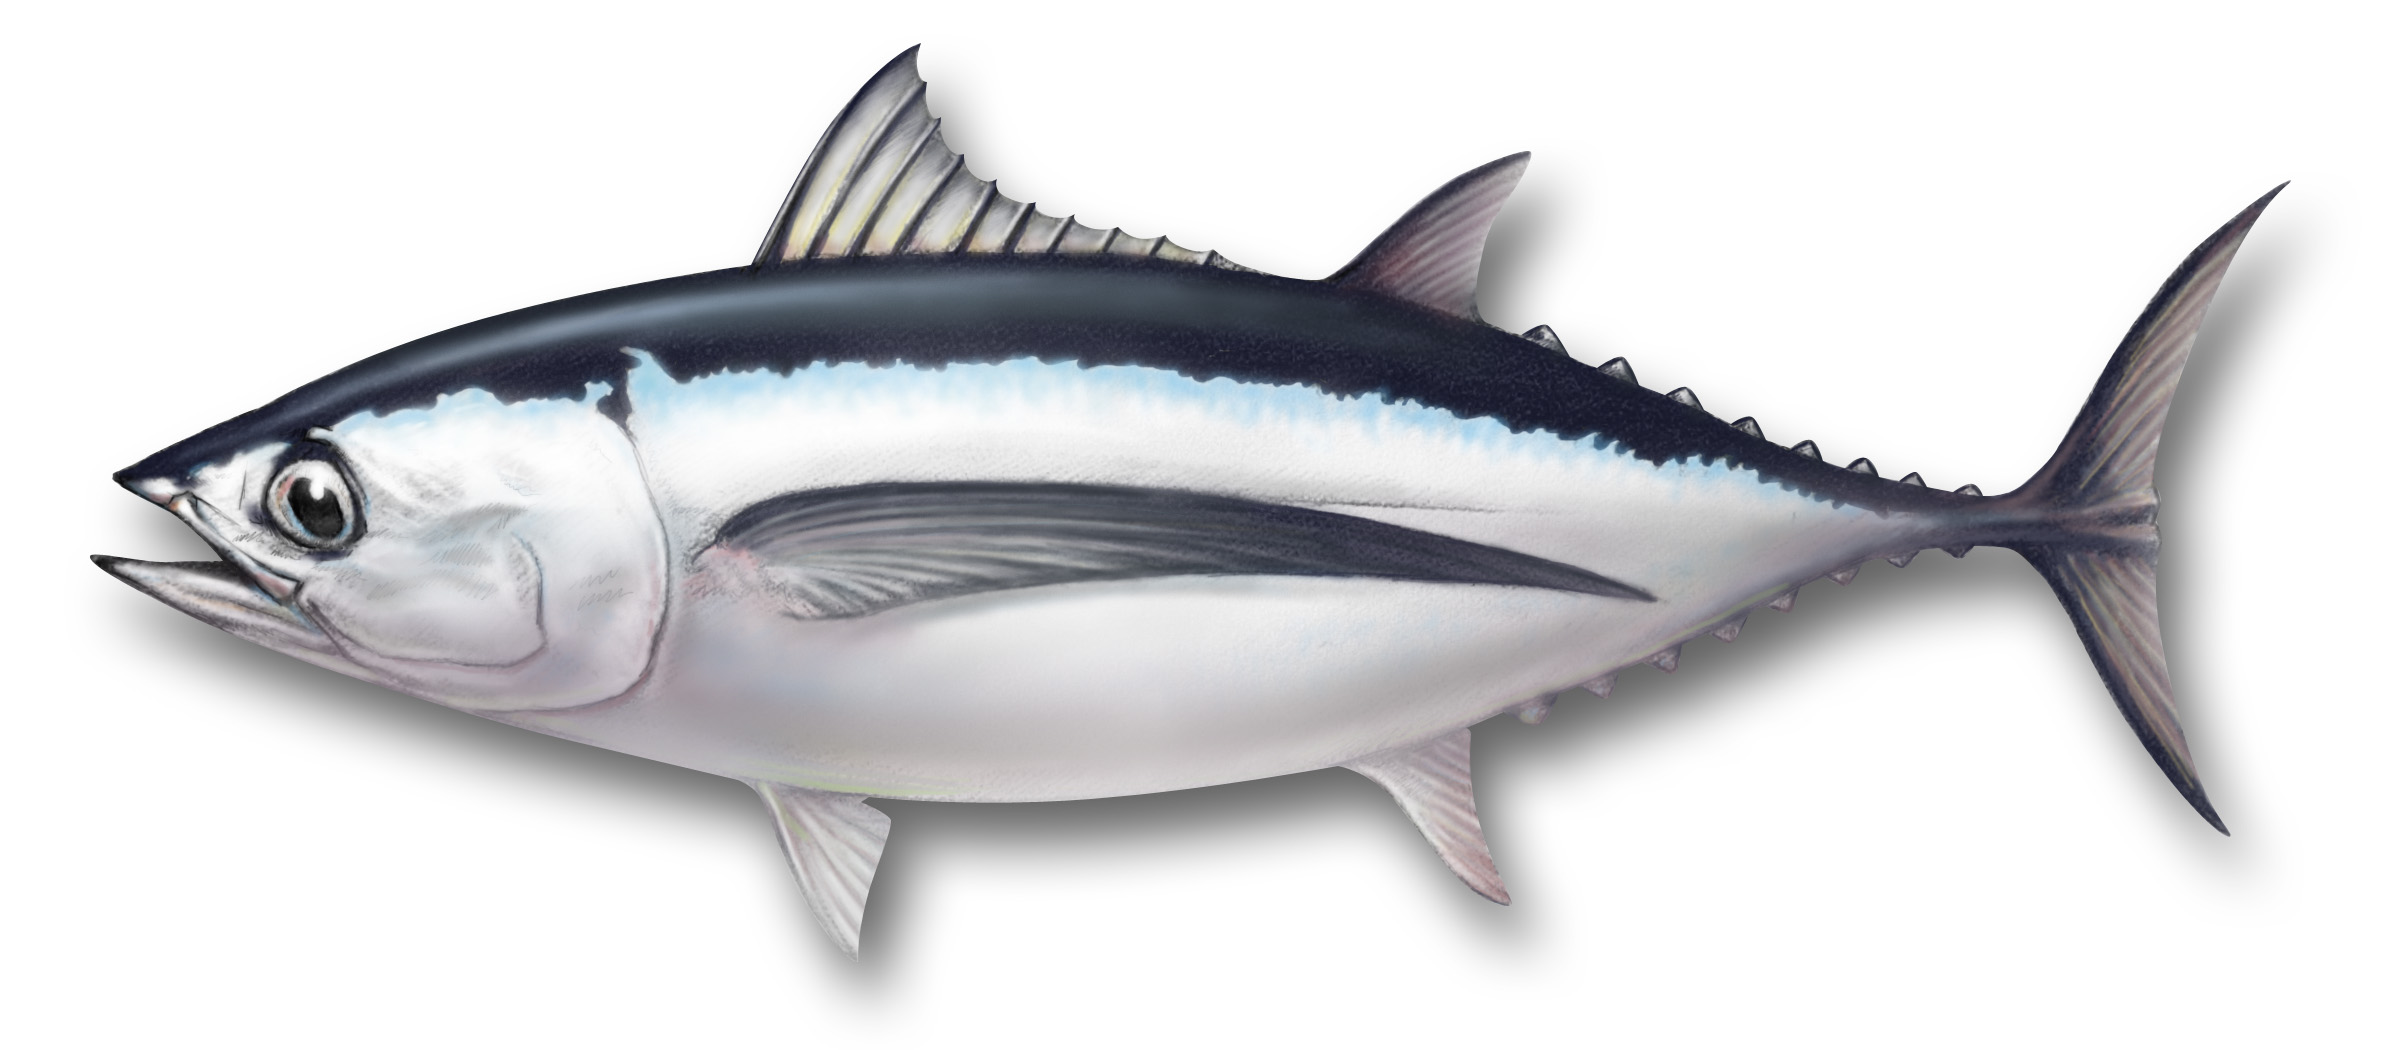 Longline randomfishblog for Fishpond fishing